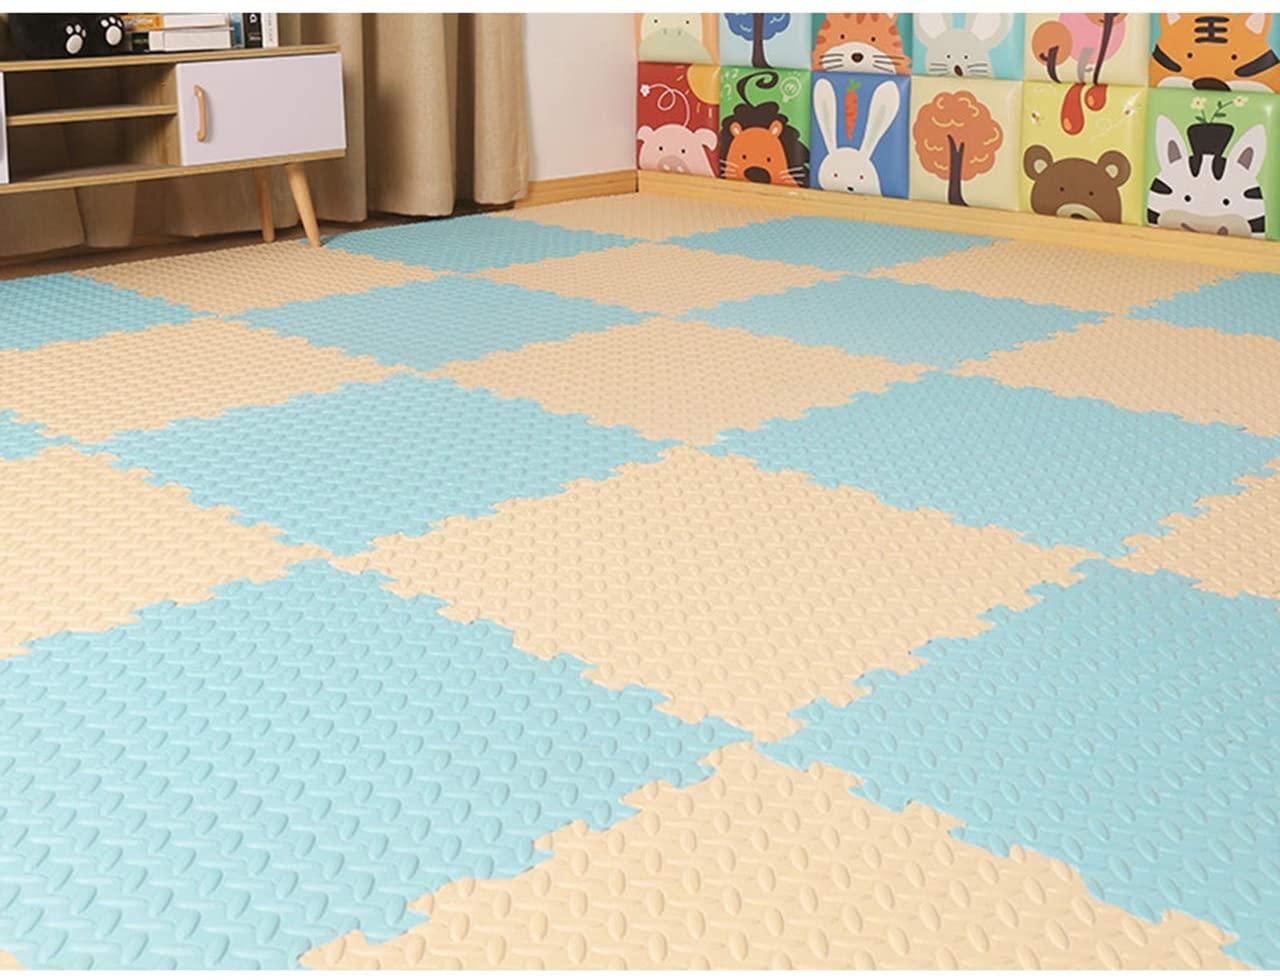 HOMRanger Solid Puzzle Interlocking Carpet,pe Padding Soft Floor Tiles Play Mat for Hard Tiles Bedroom Living Room Exercise Play E 30302.5cm(30 Pack)